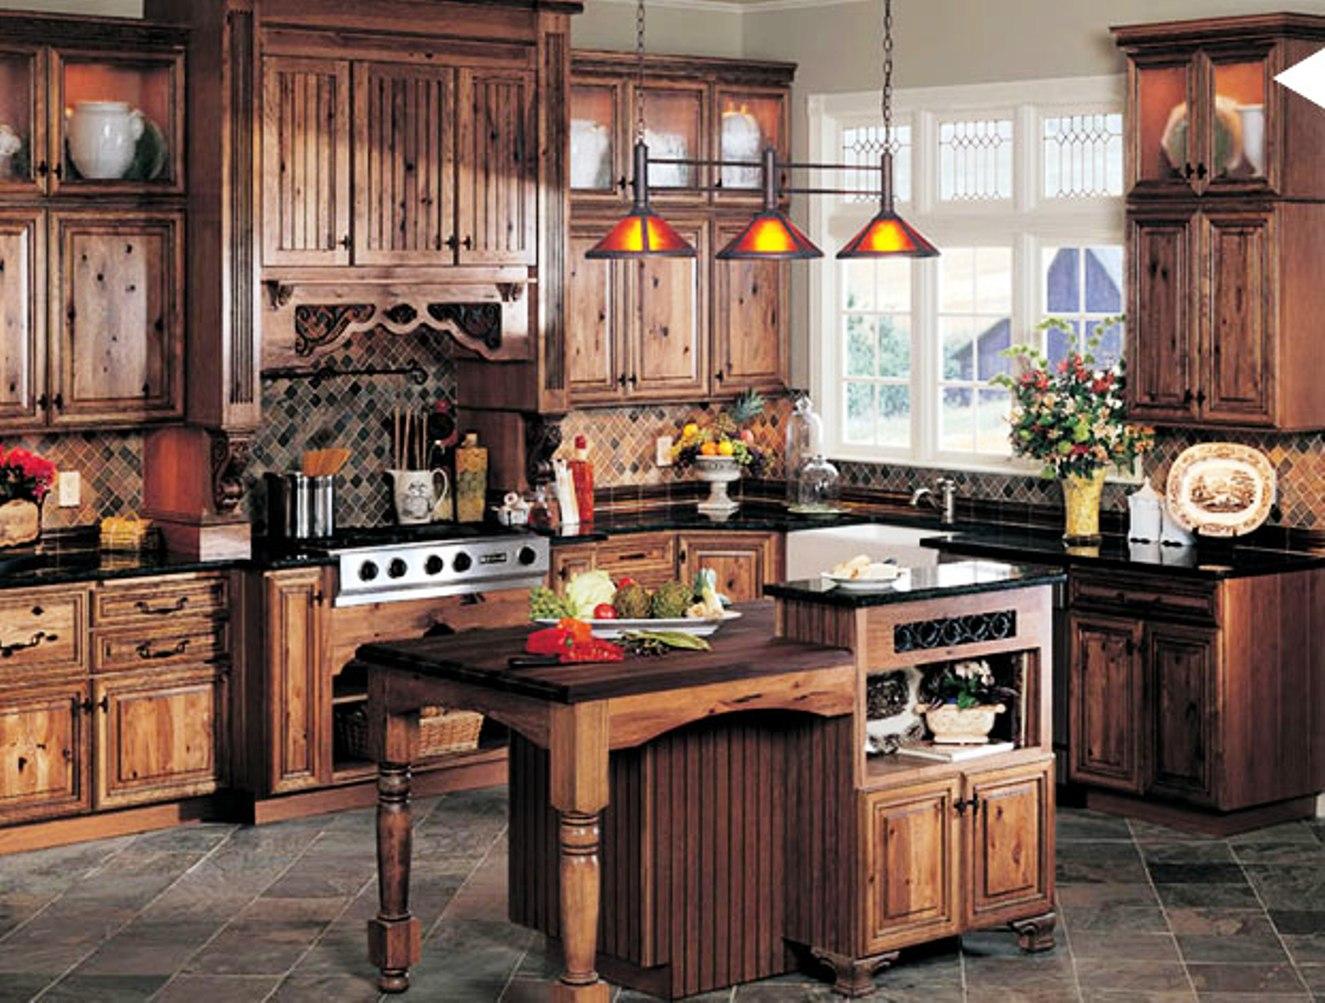 Rustic Kitchen Cabinets - Rustic Kitchen Design Inspiration